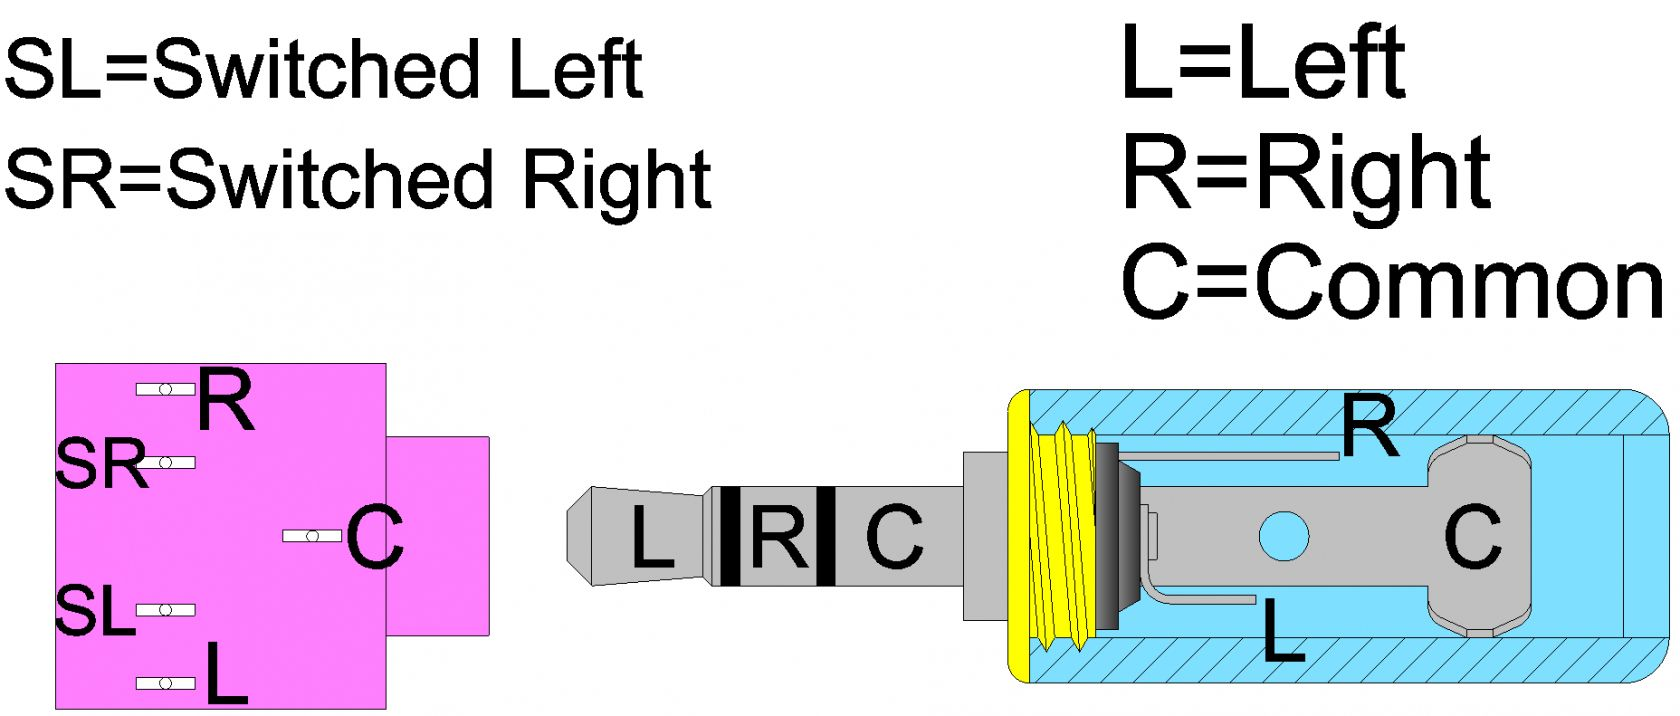 Incredible Firestik Wiring Diagram Wiring Library Wiring Cloud Picalendutblikvittorg